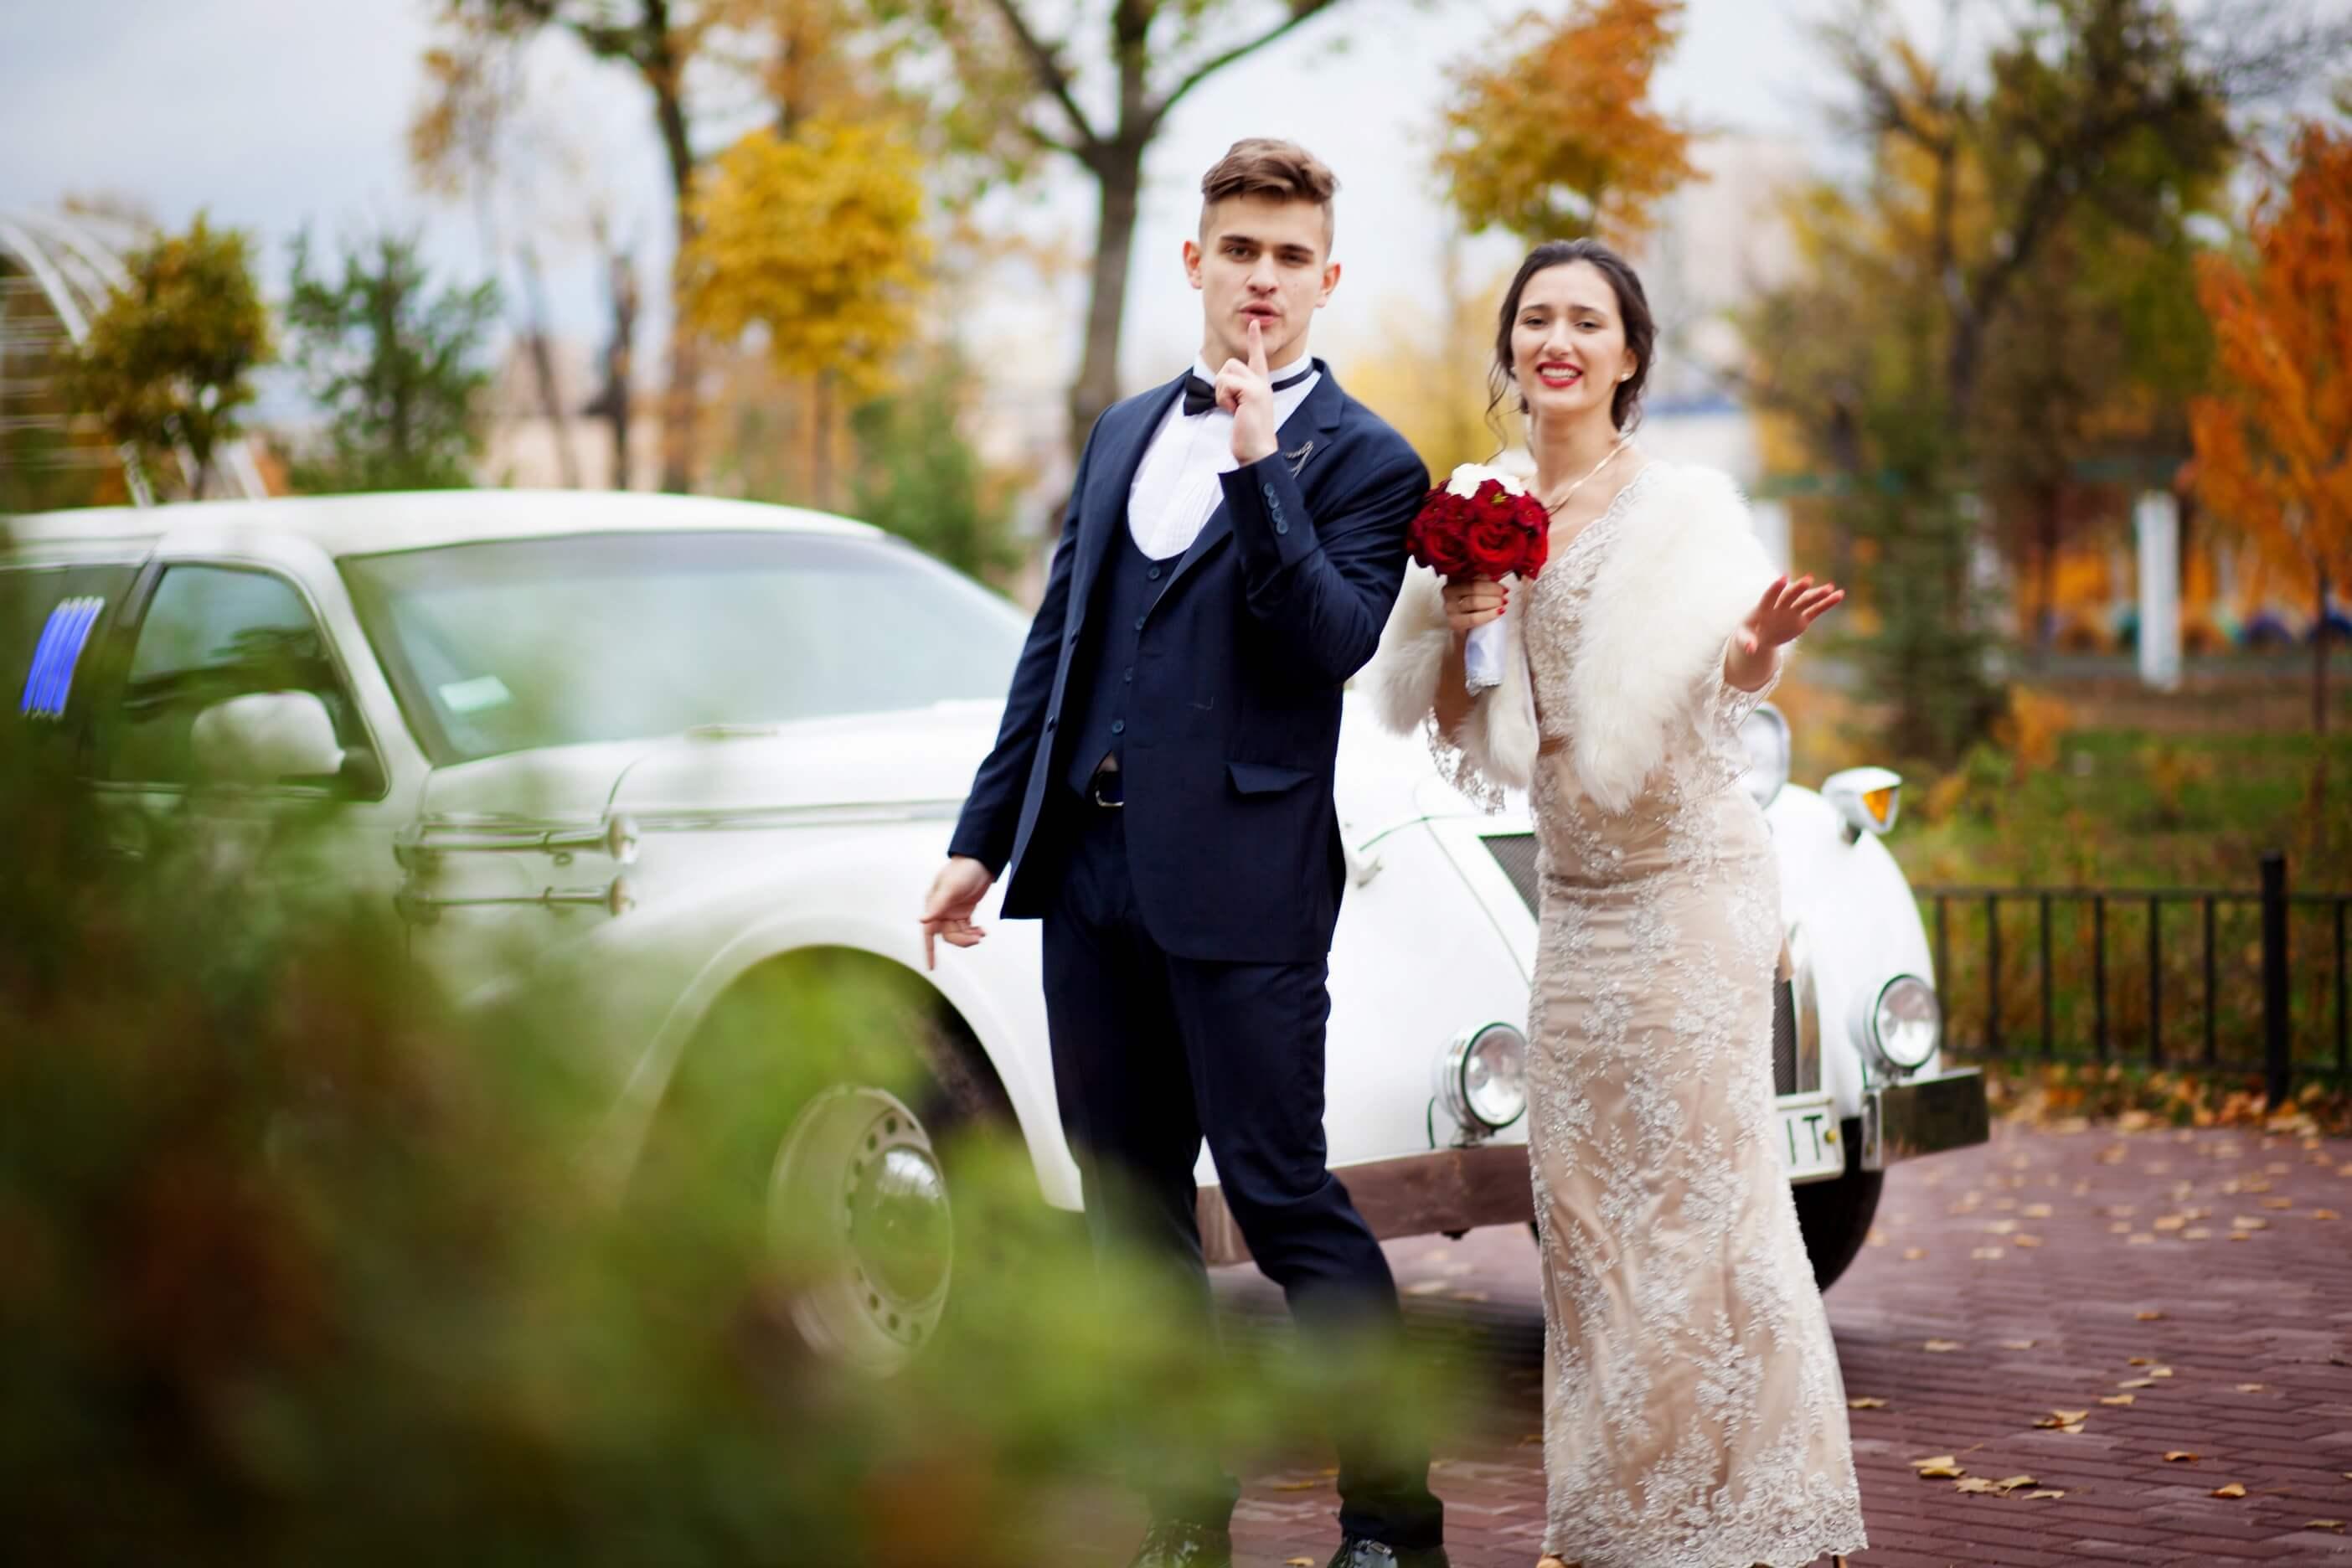 1 fotograf na svad'bu kiev ceny (3)